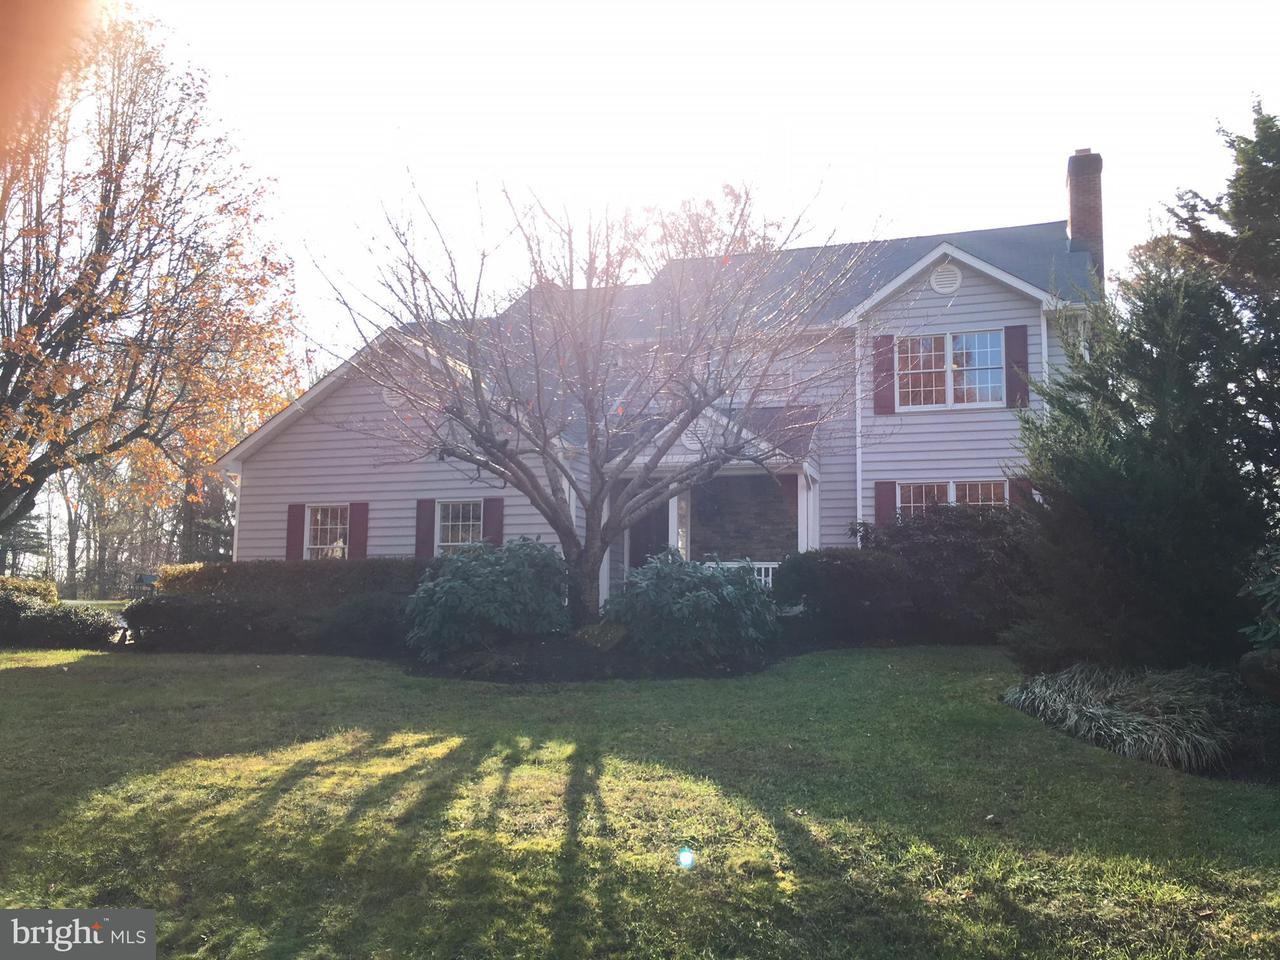 Single Family Home for Sale at 1805 HUNTCREEK RUN 1805 HUNTCREEK RUN Gambrills, Maryland 21054 United States